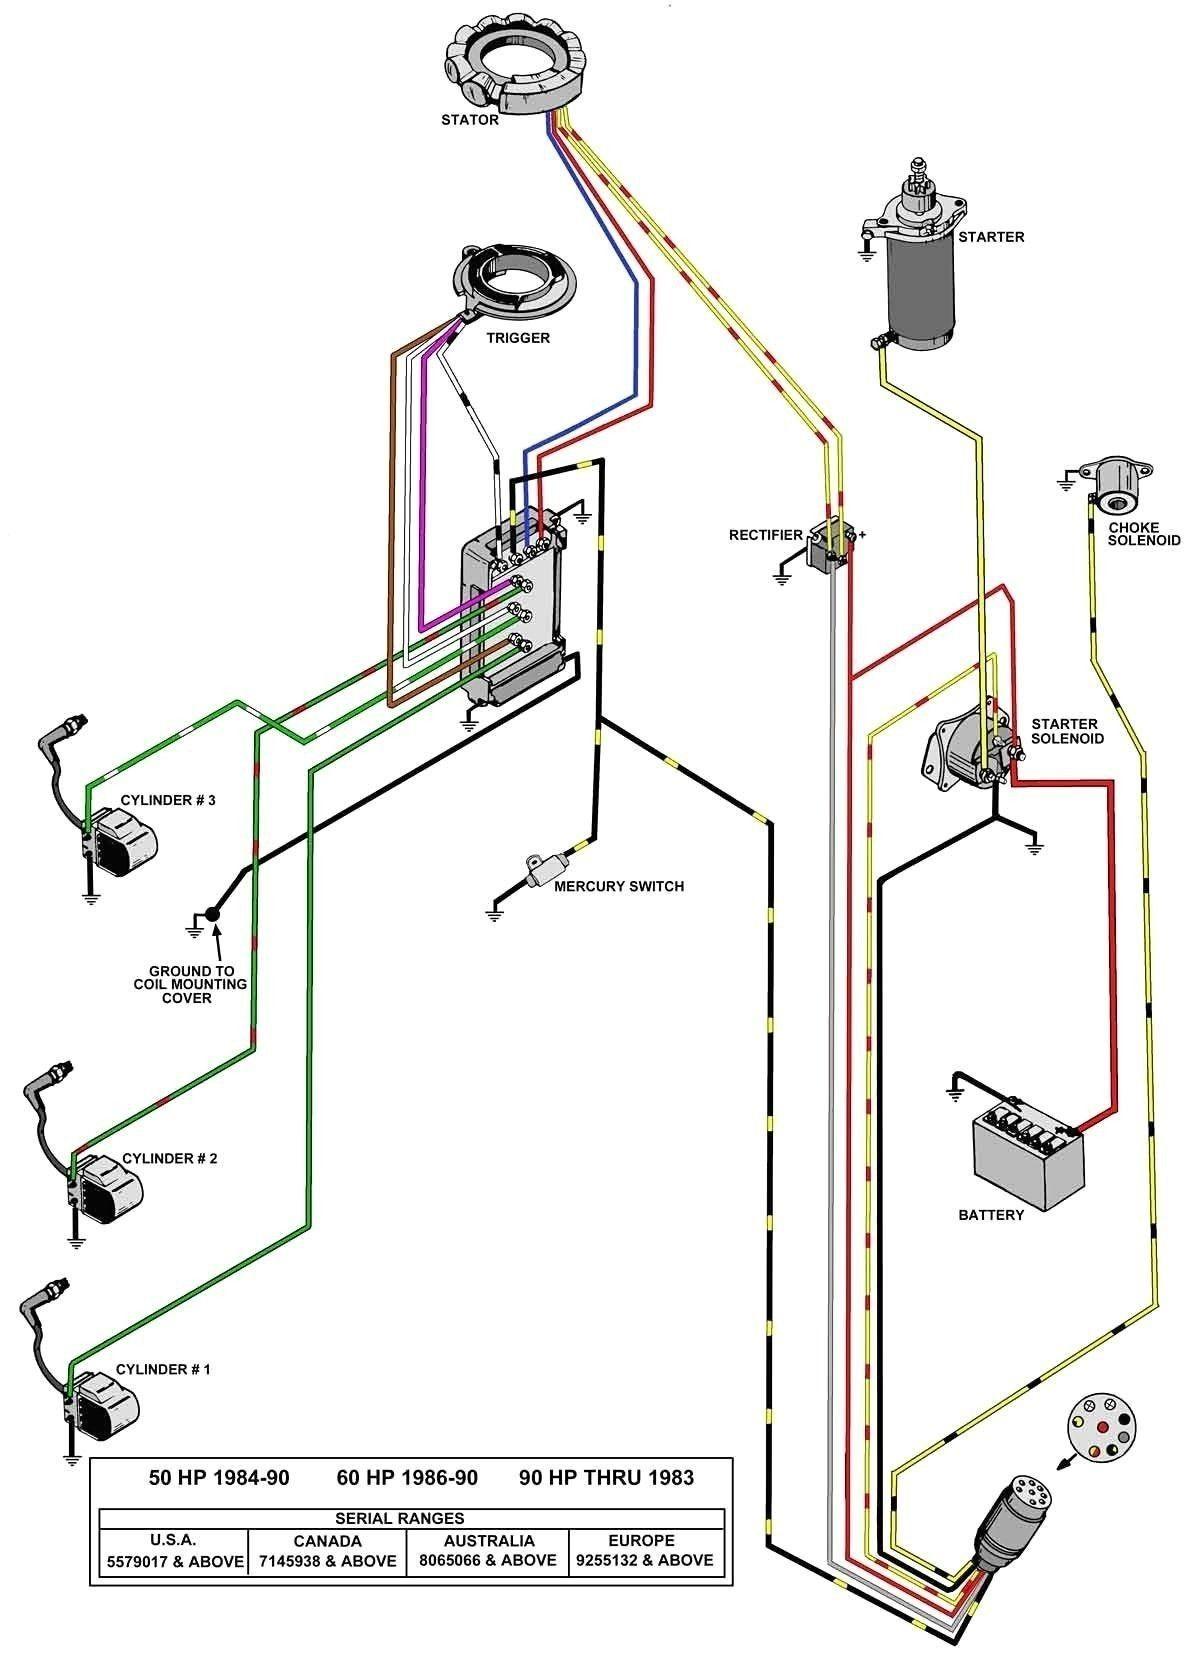 basic wiring diagram for harley davidson wiringdiagramorg